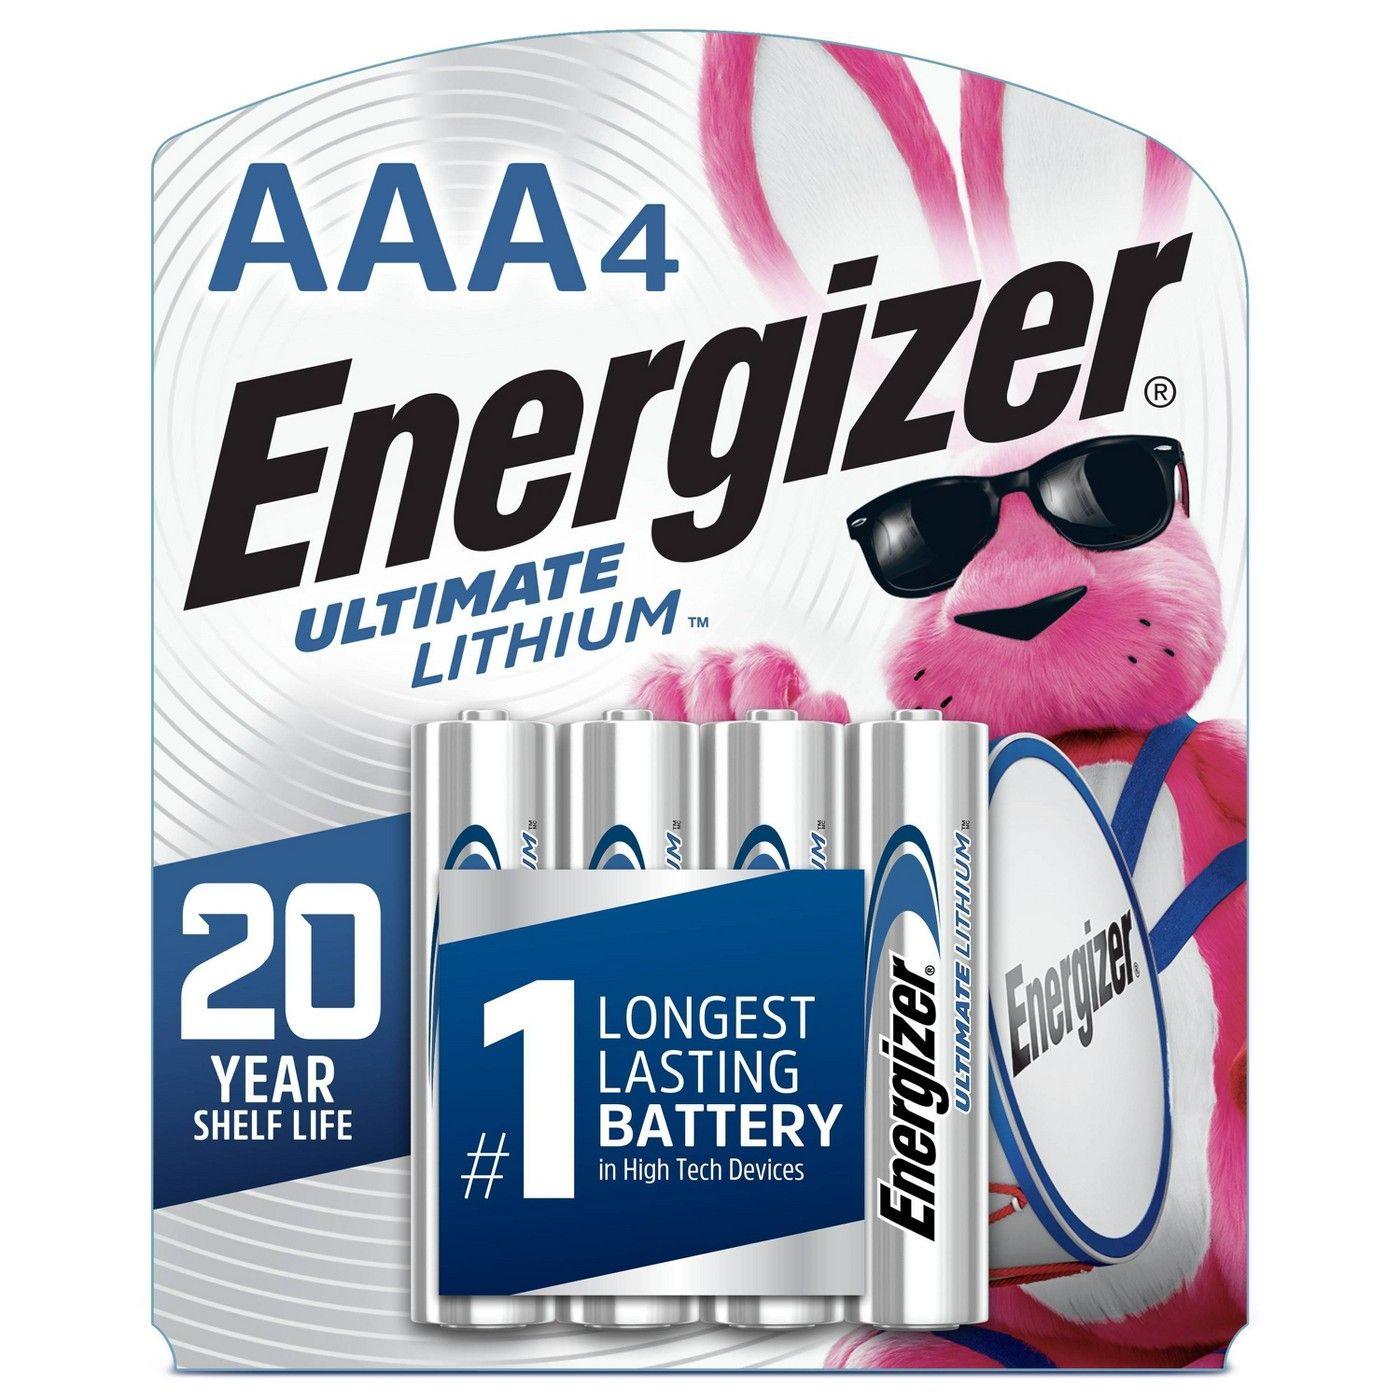 Energizer 4pk Ultimate Lithium Aaa Batteries Energizer Energizer Battery 9 Volt Battery